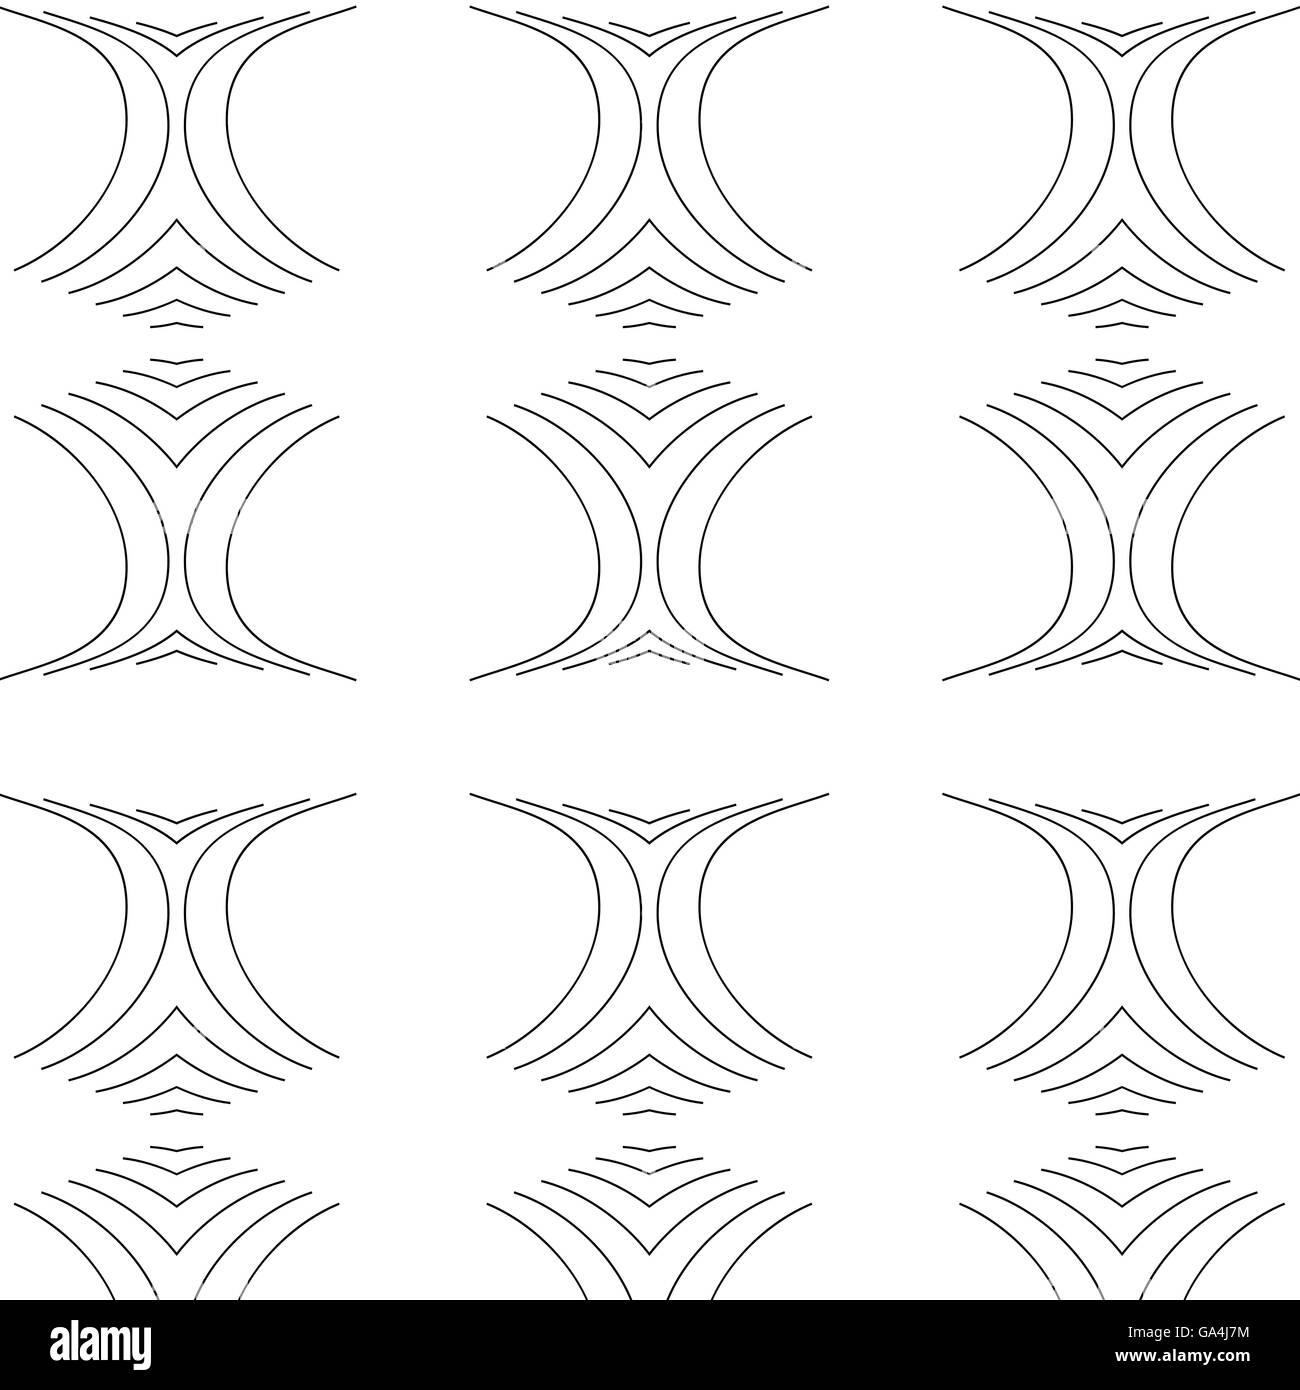 Primitive simple grey modern pattern - Stock Image